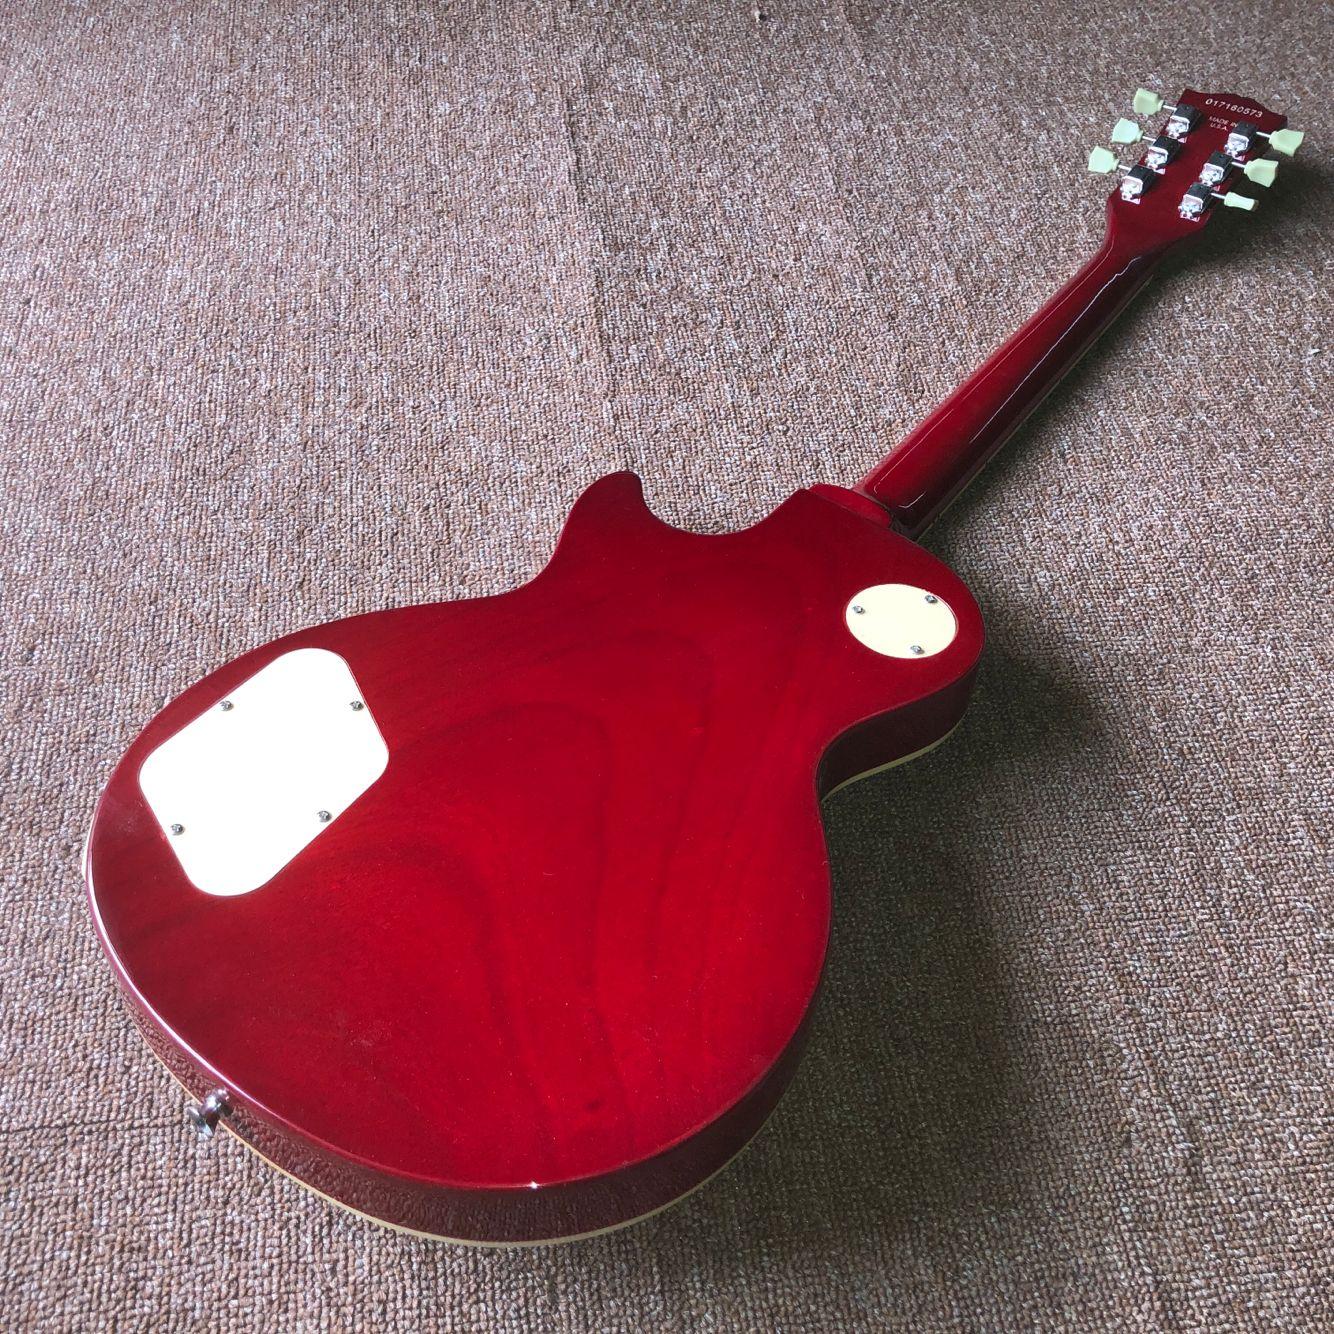 New standard Custom.Sunburst Tiger Flame electric guitar. mahogany body gitaar,handwork 6 Strings guitarra. enlarge